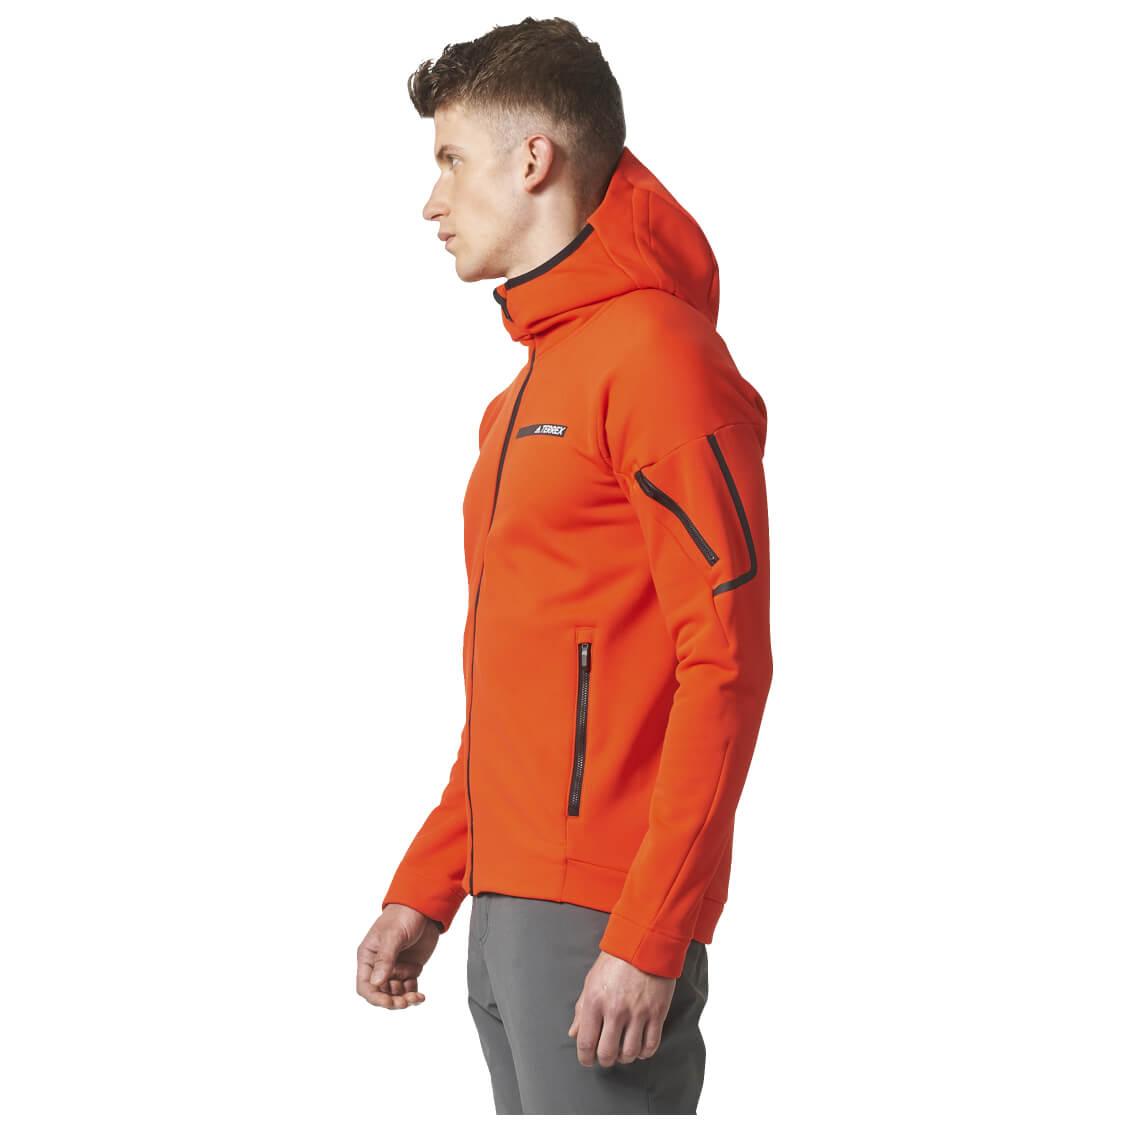 Adidas Terrex Climaheat Ultimate Fleece Jacket Veste